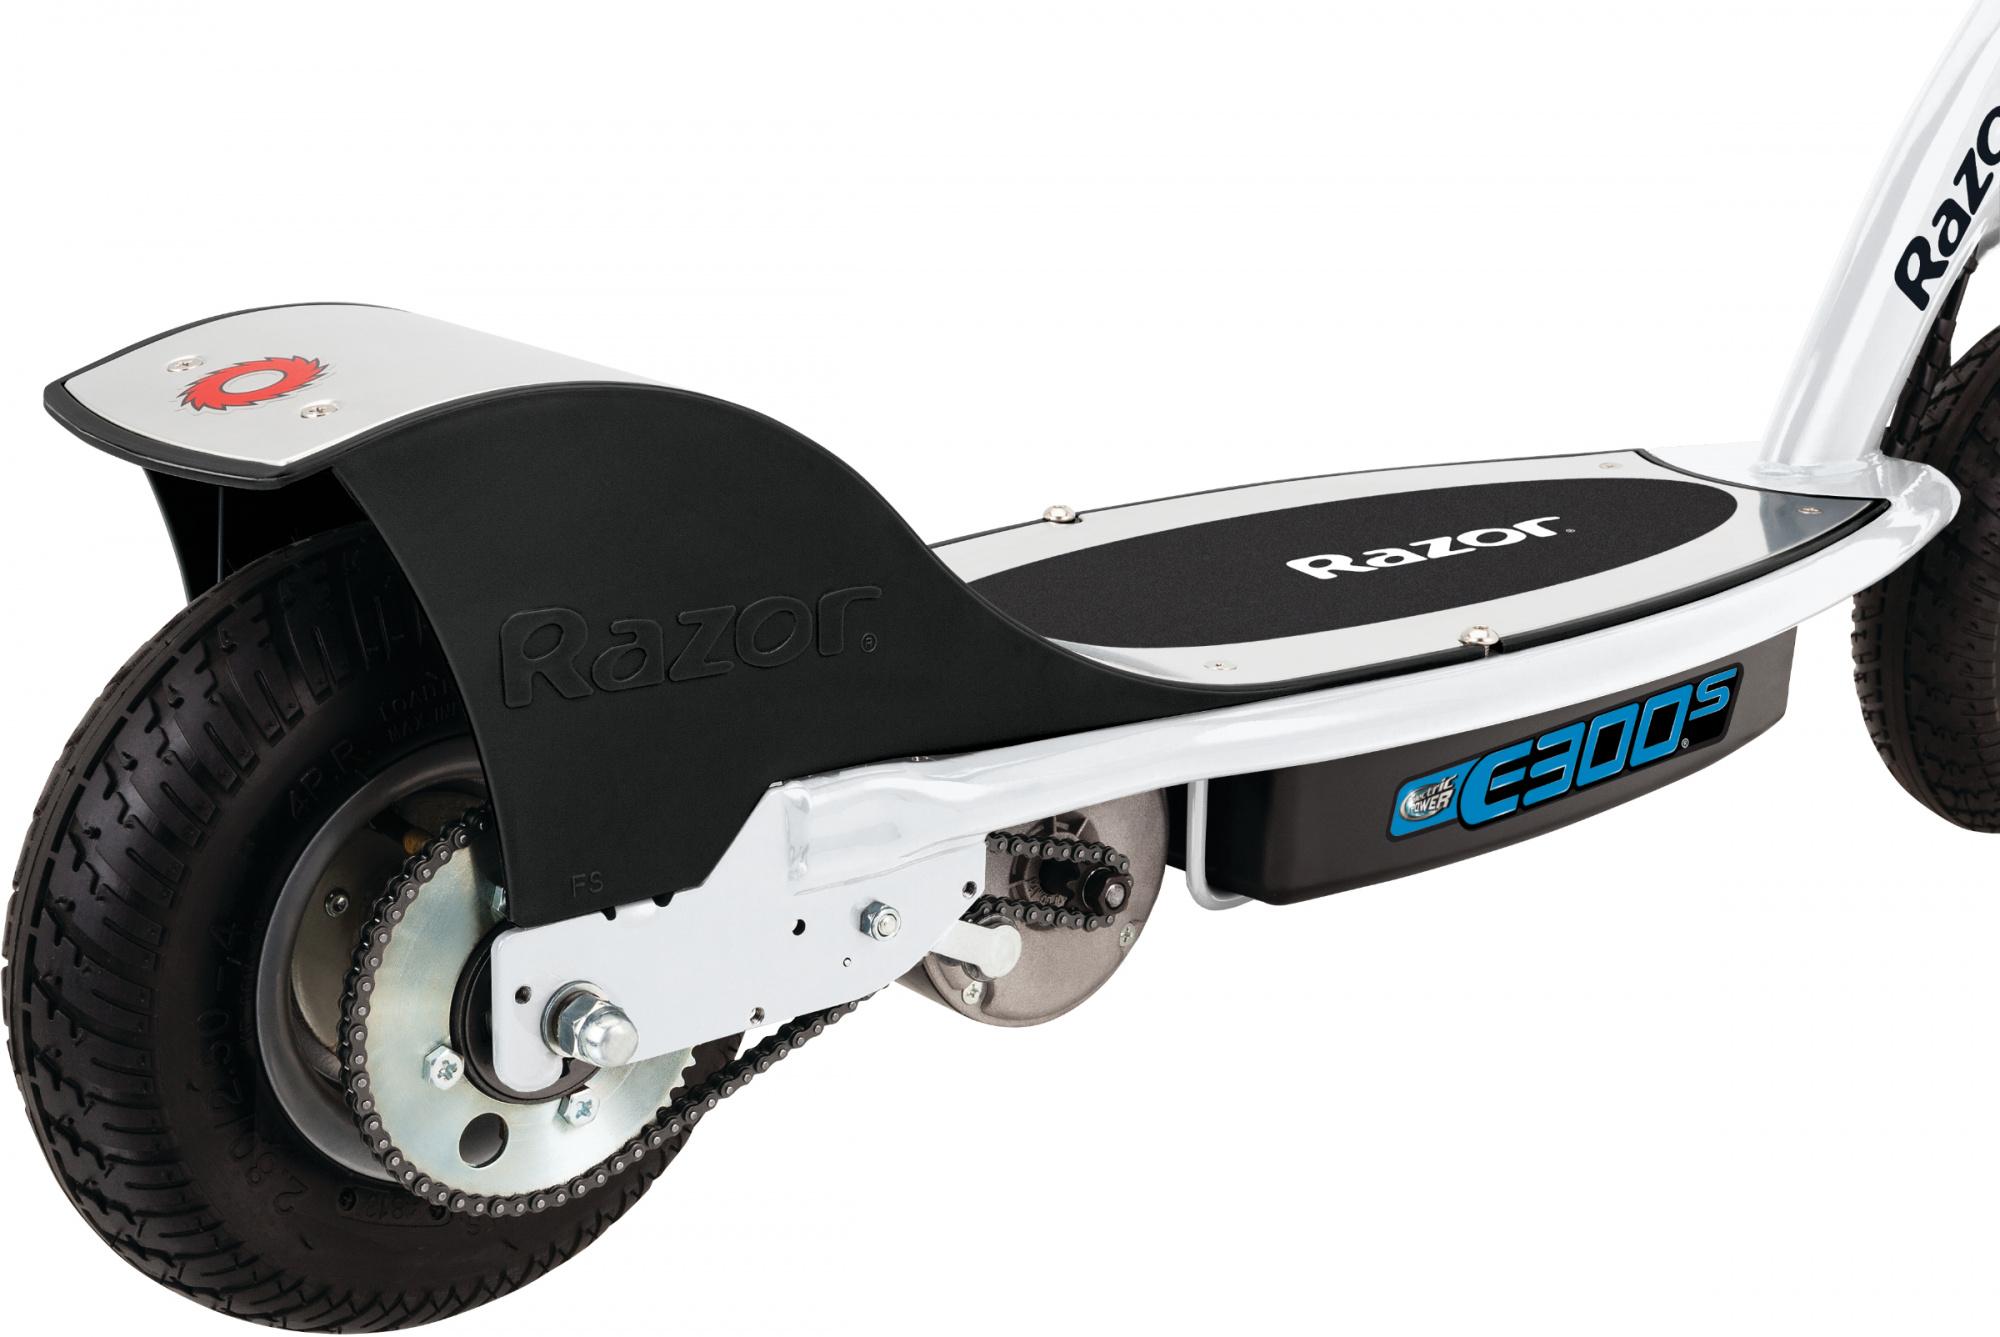 REPLACEMENT INNER TUBE 3.0-4 RAZOR E300 BLADEZ XTR MOBY MINIMOTO SPORT RACER